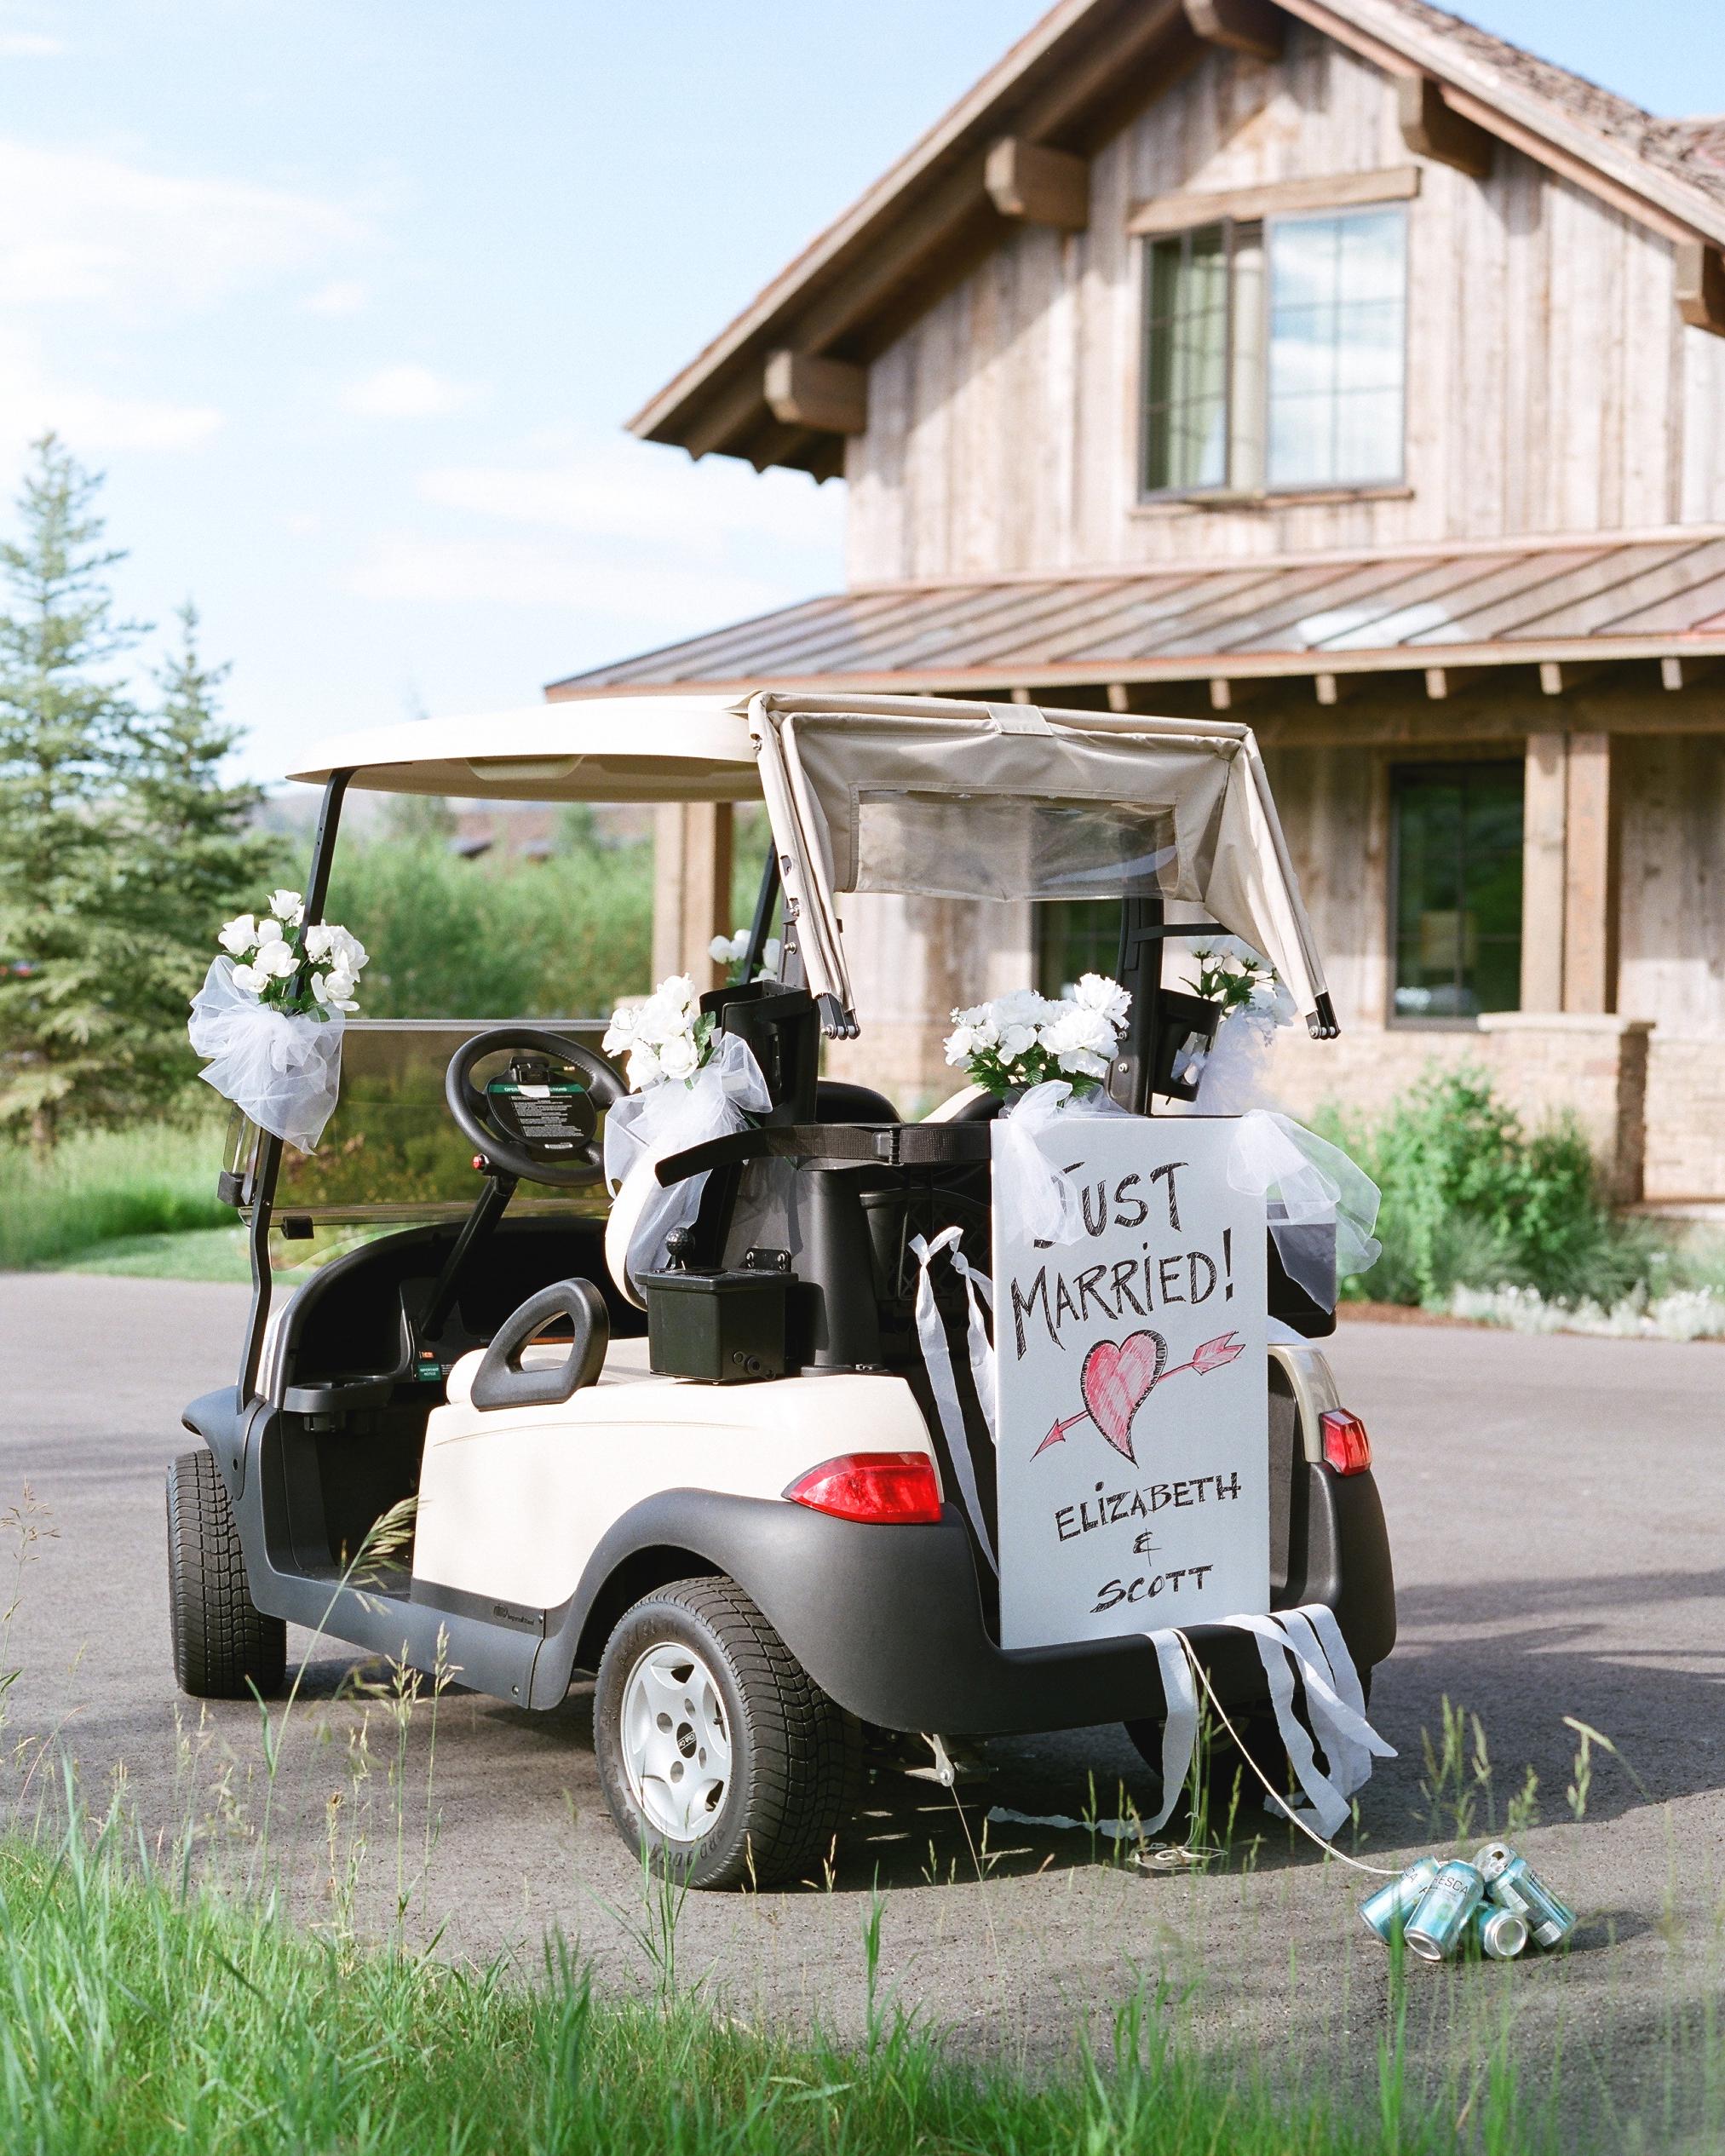 elizabeth-scott-wedding-cart-0314.jpg